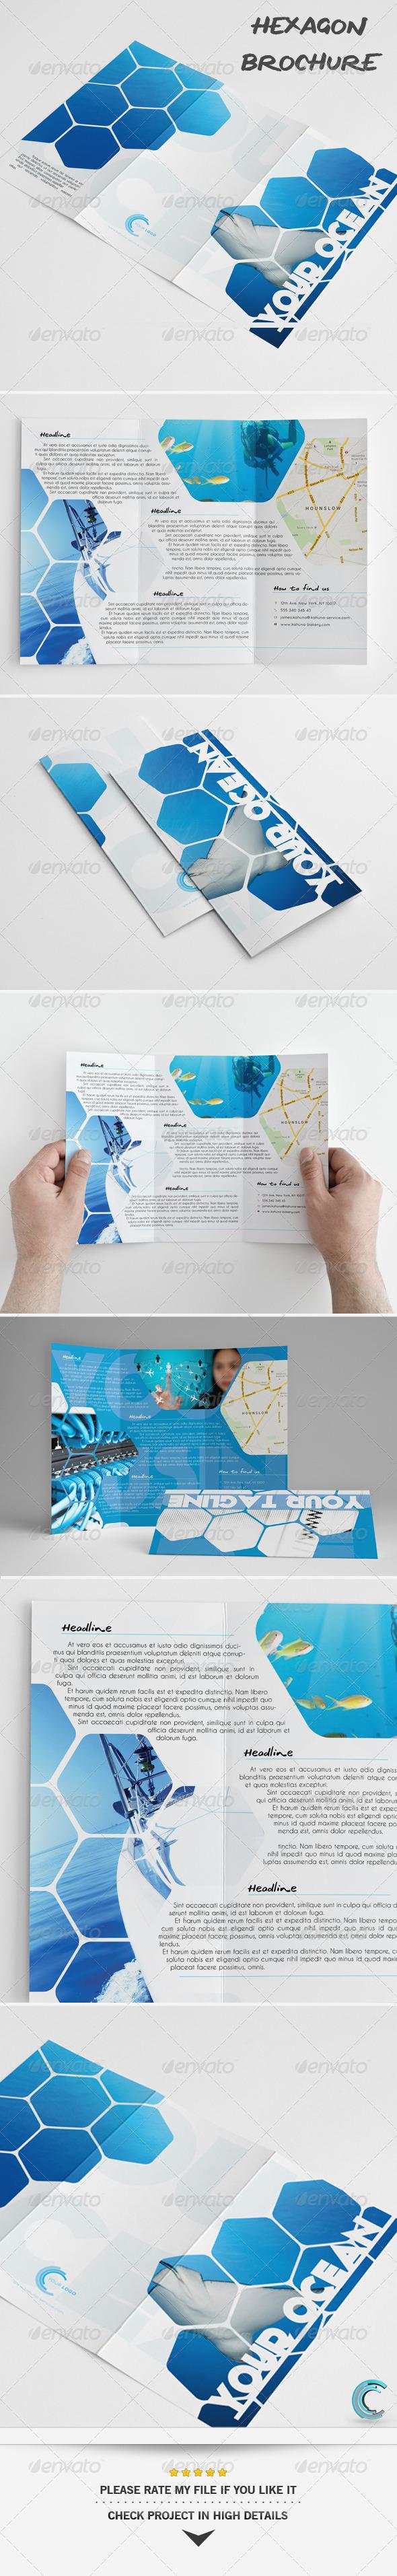 Hexagon Universal Brochure - Miscellaneous Print Templates